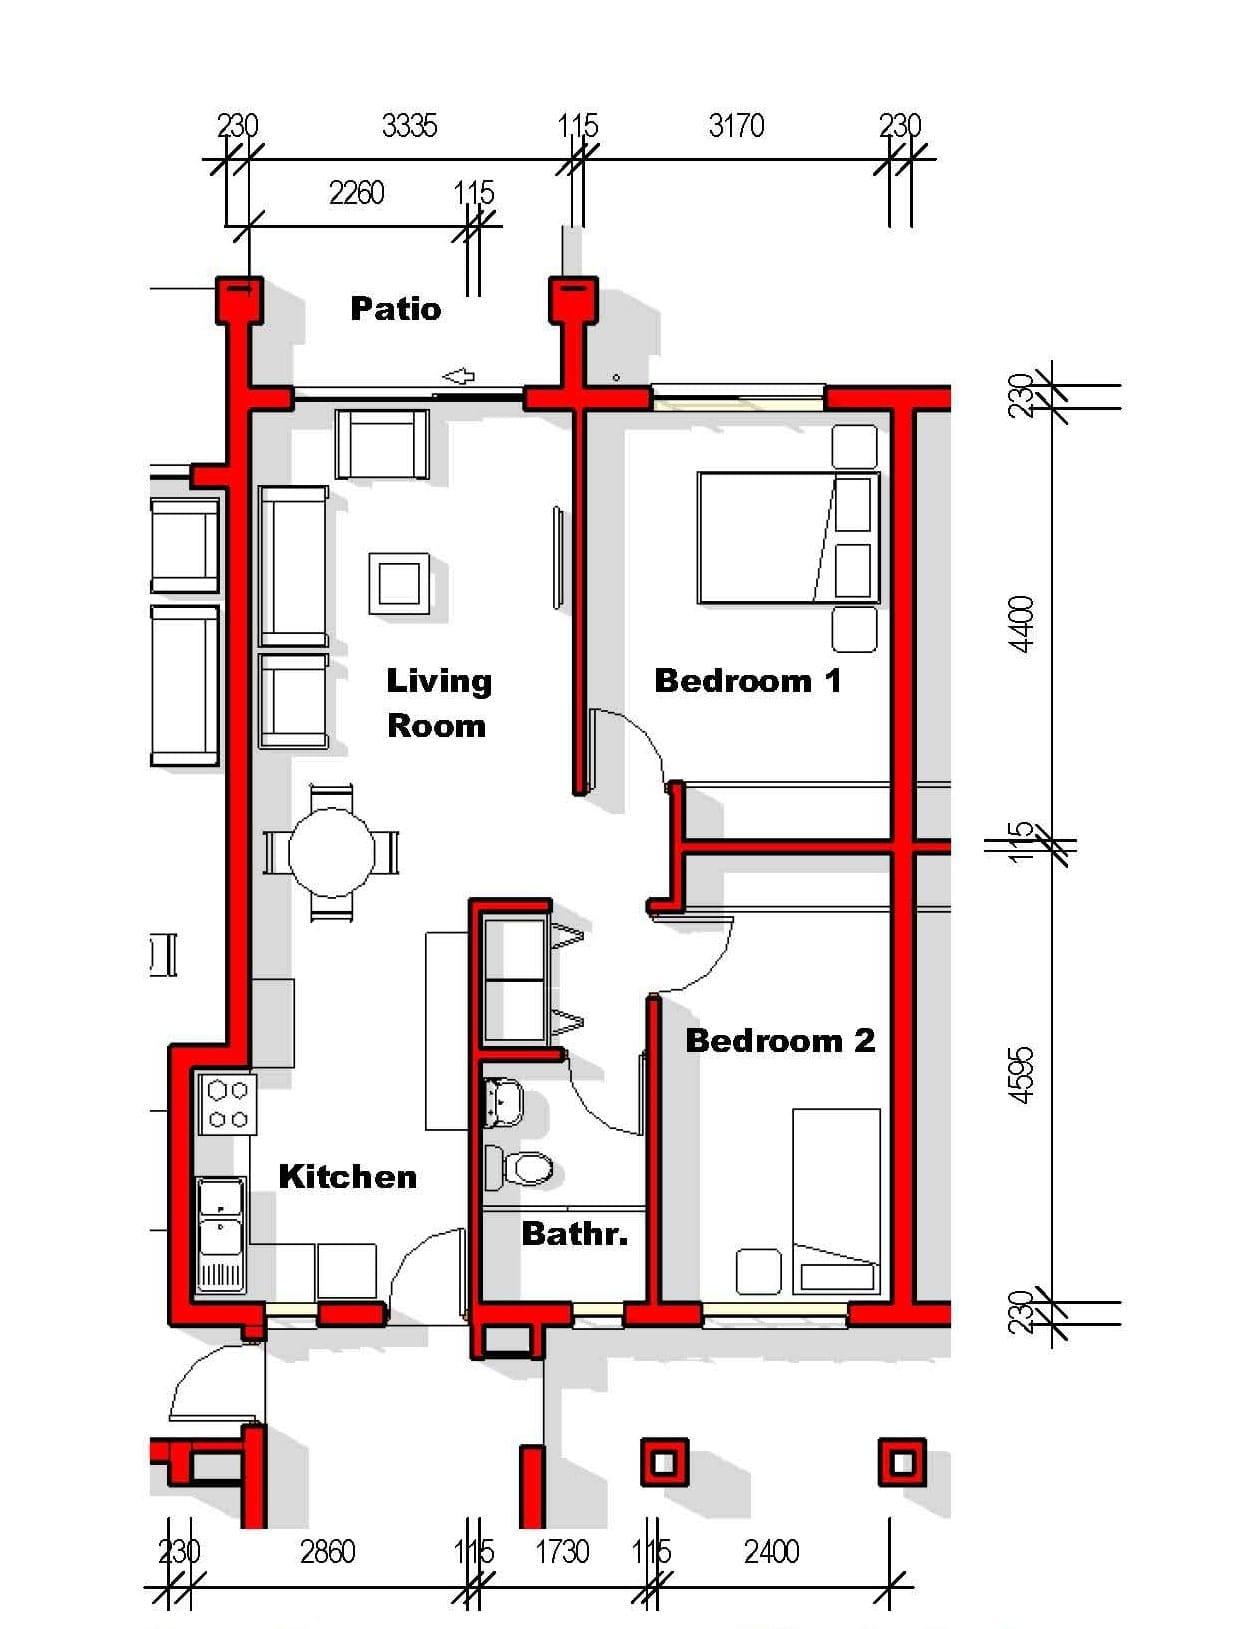 IQ Arabella Unit Plan 3 bedroom 2 bathroom North